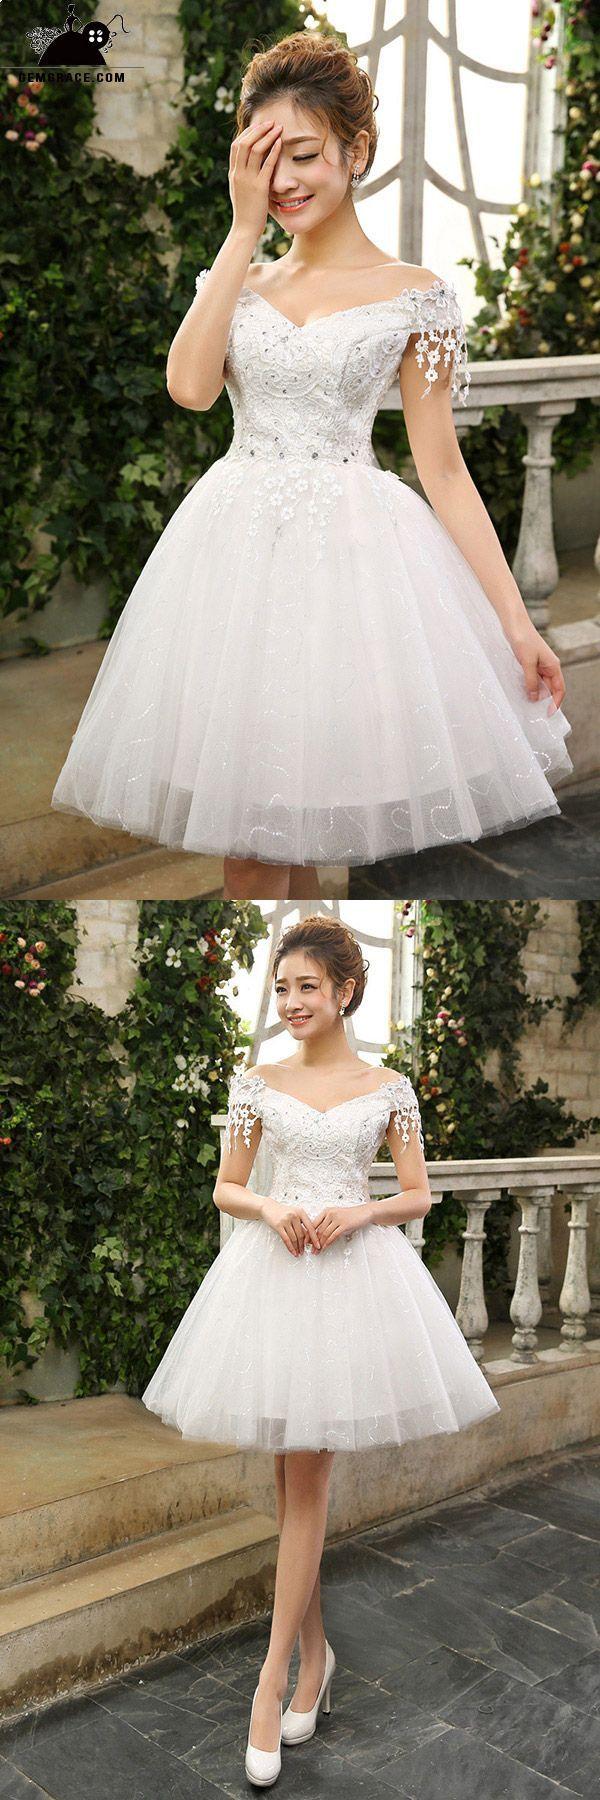 Pin On Sweet Short Wedding Dress [ 1800 x 600 Pixel ]